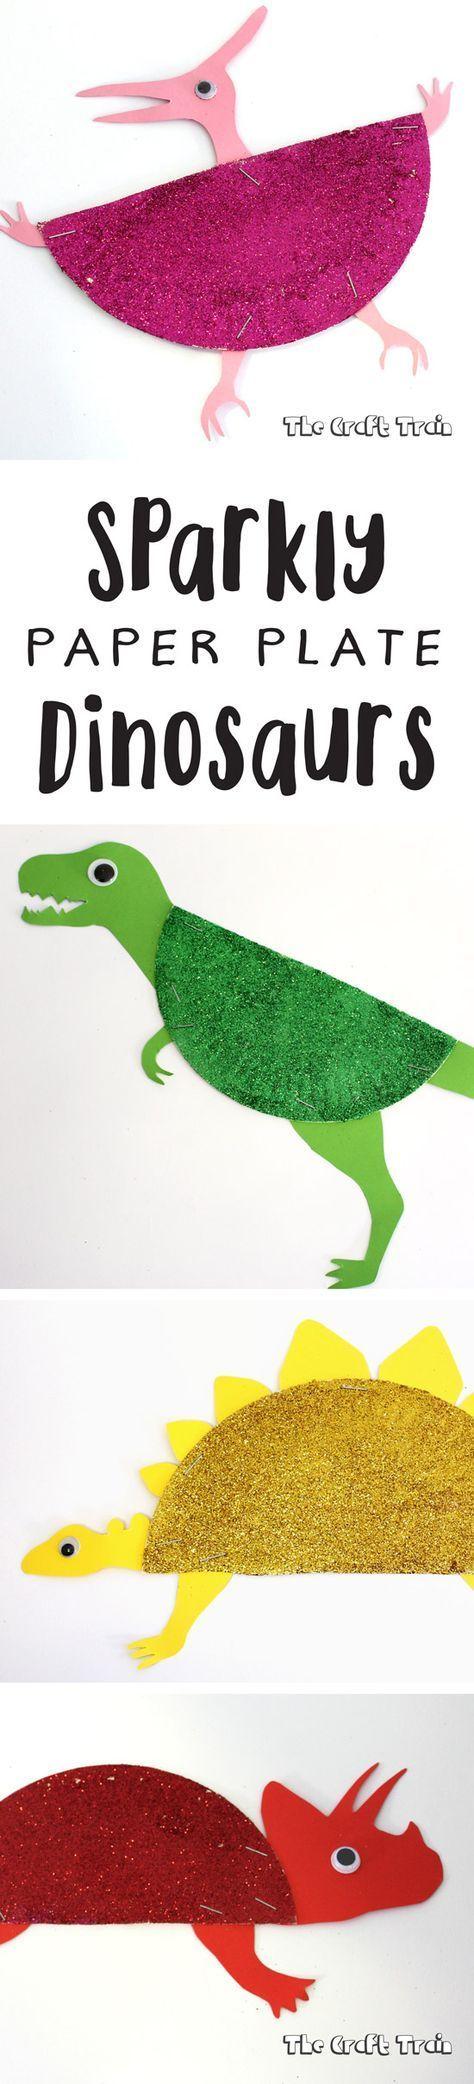 210 best Dinosaurs images on Pinterest | Dinosaur activities ...